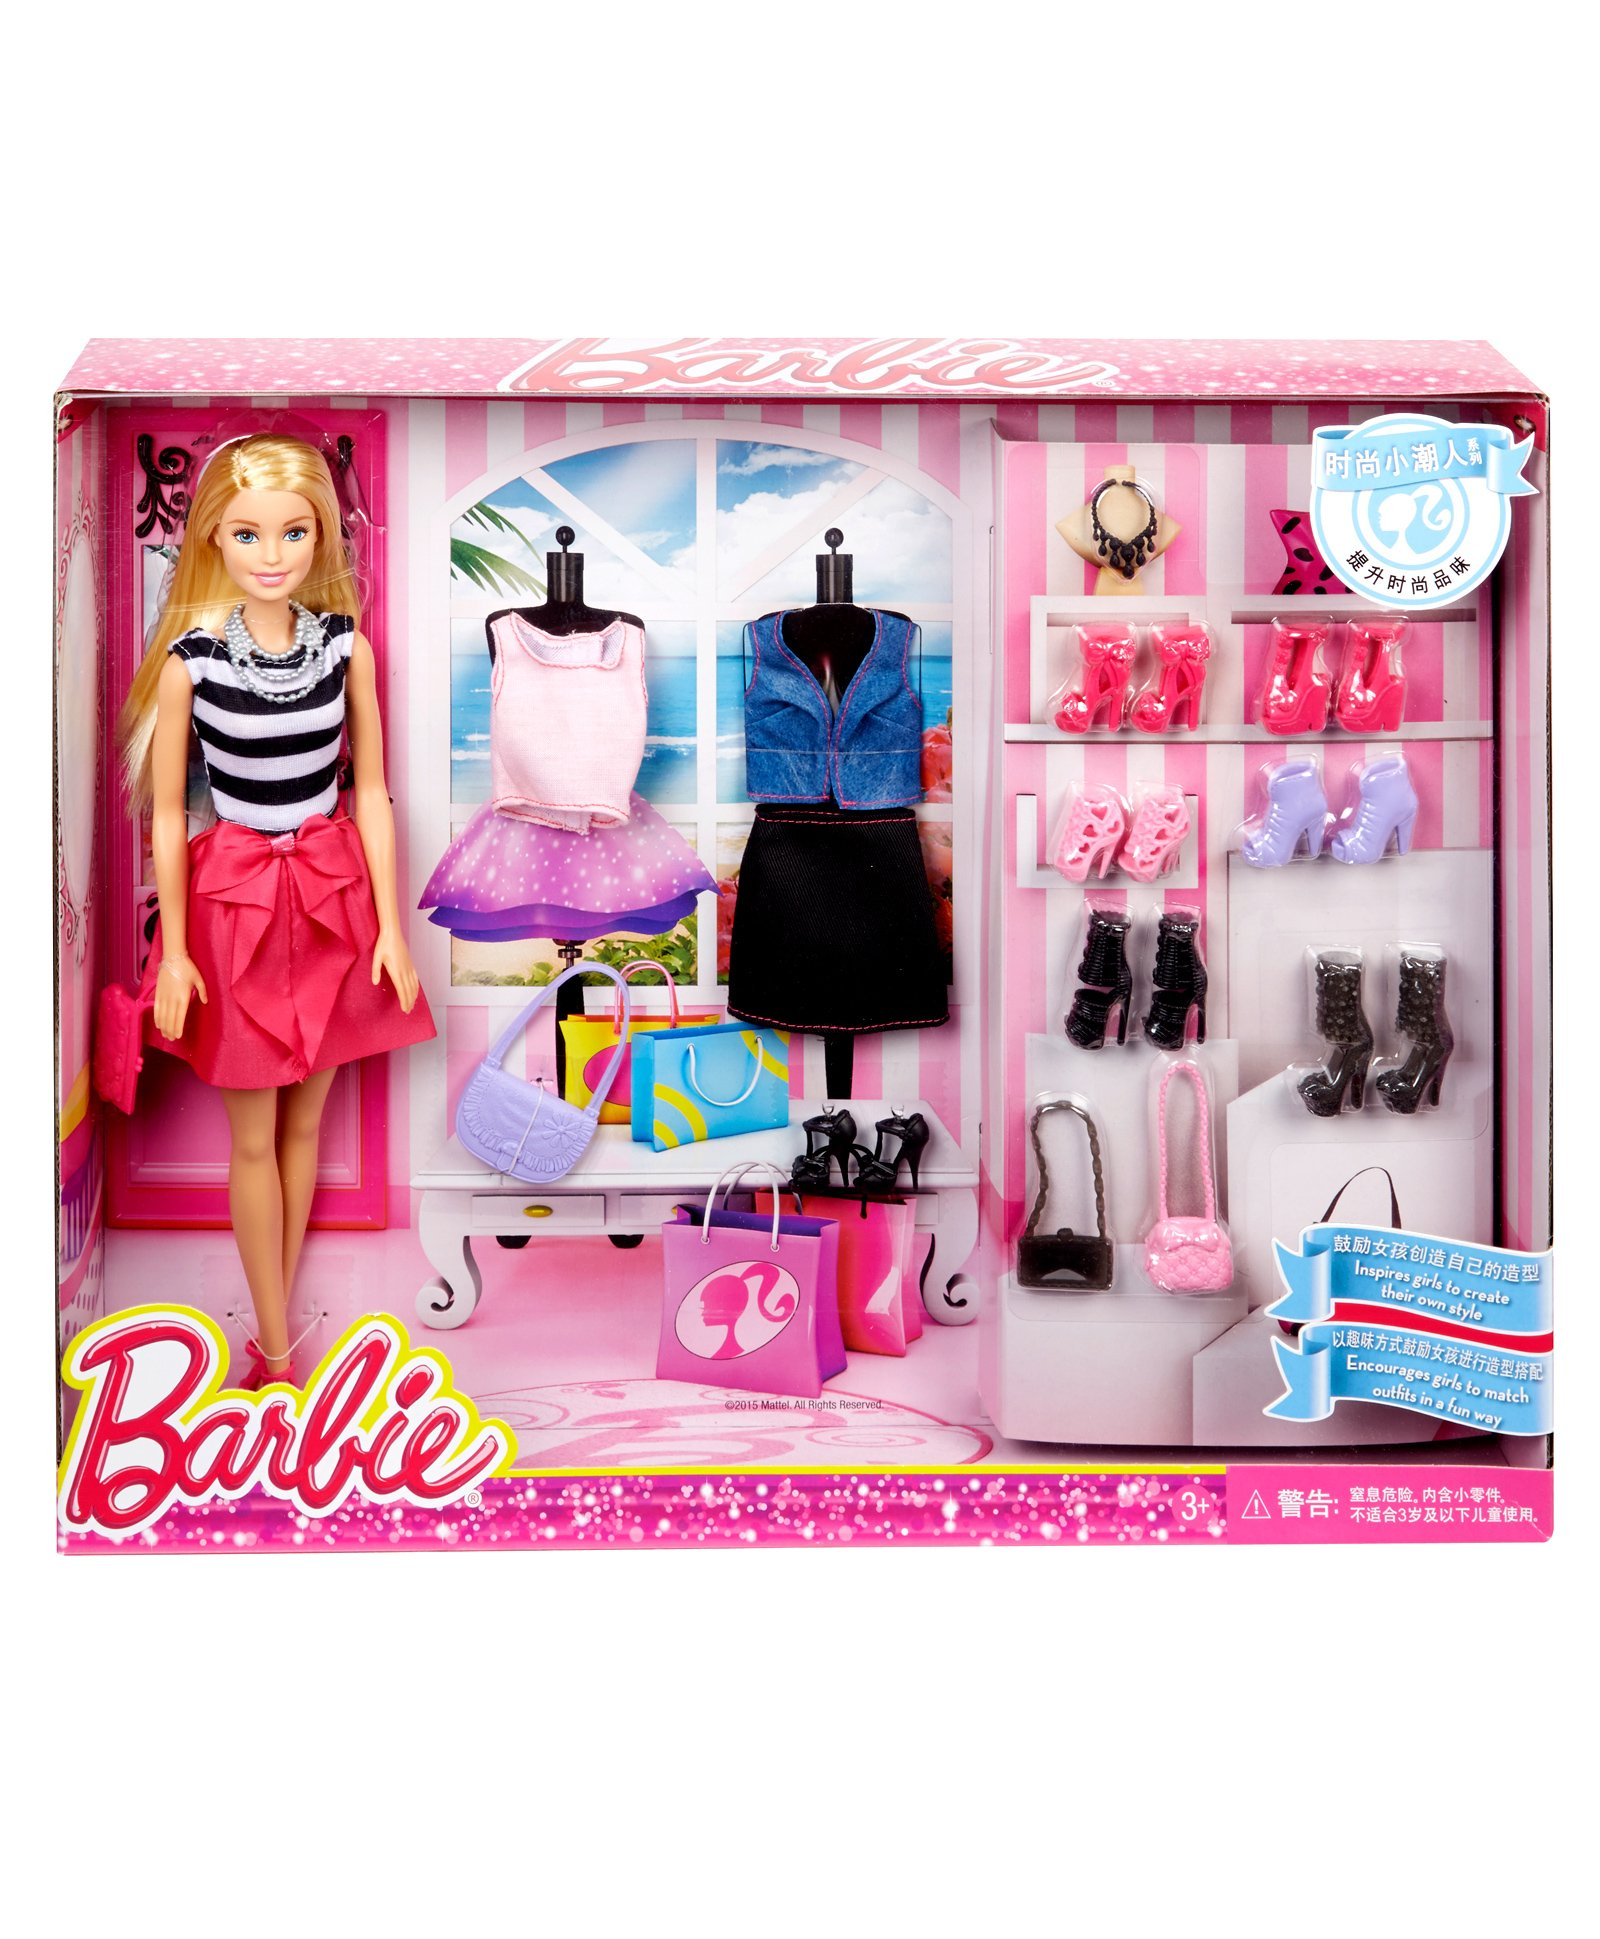 Barbie Fashions & Accessories Multicolor - 29 cm